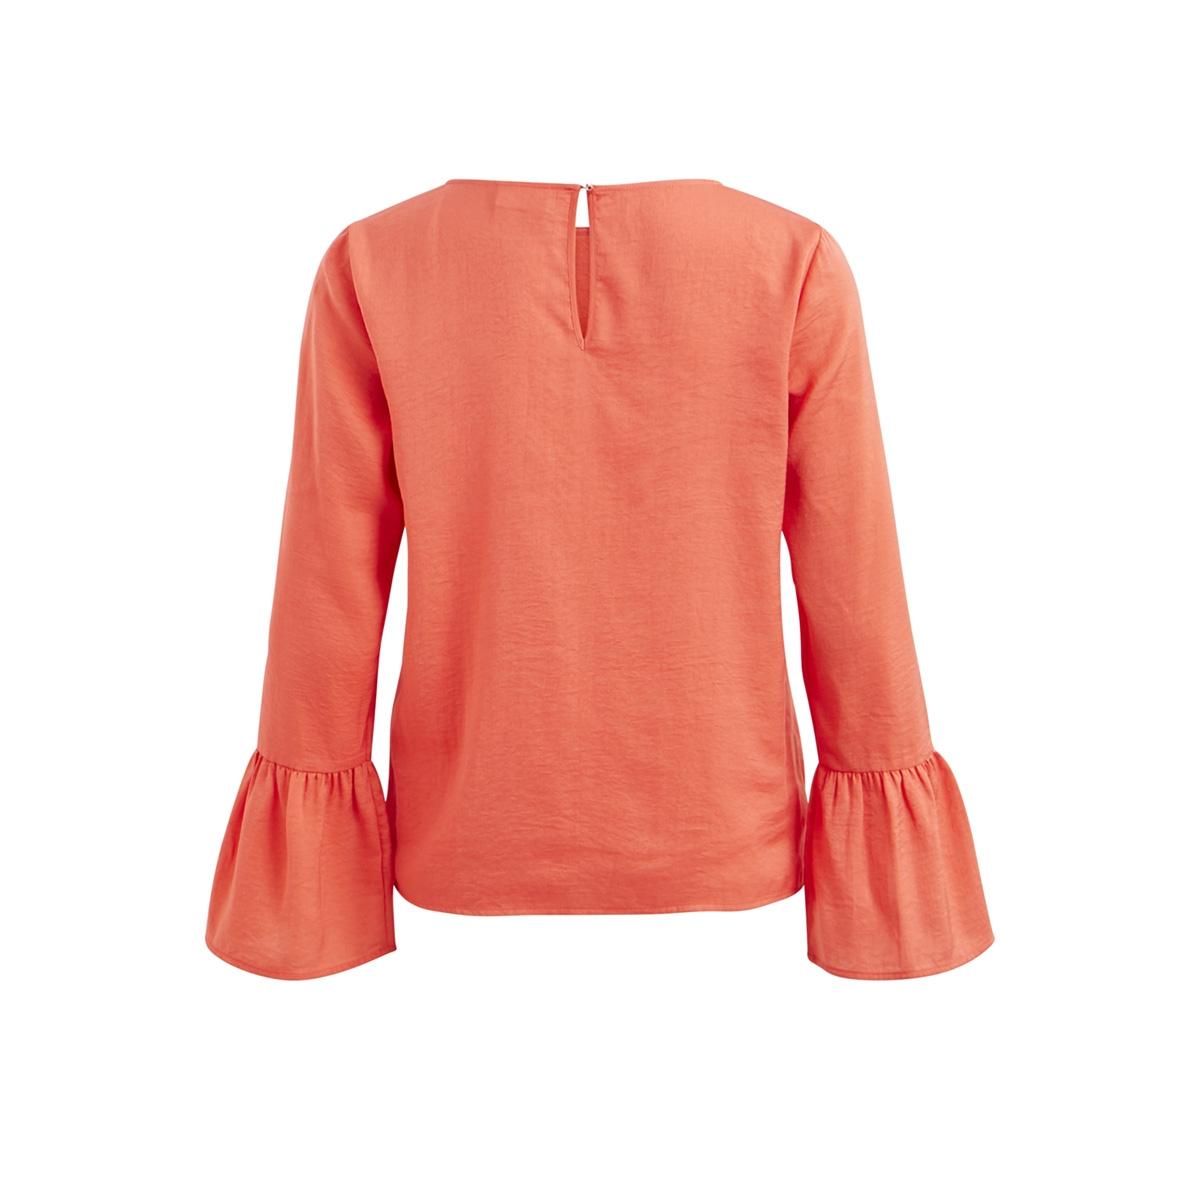 virassi l/s top/pb 14044420 vila blouse spiced coral